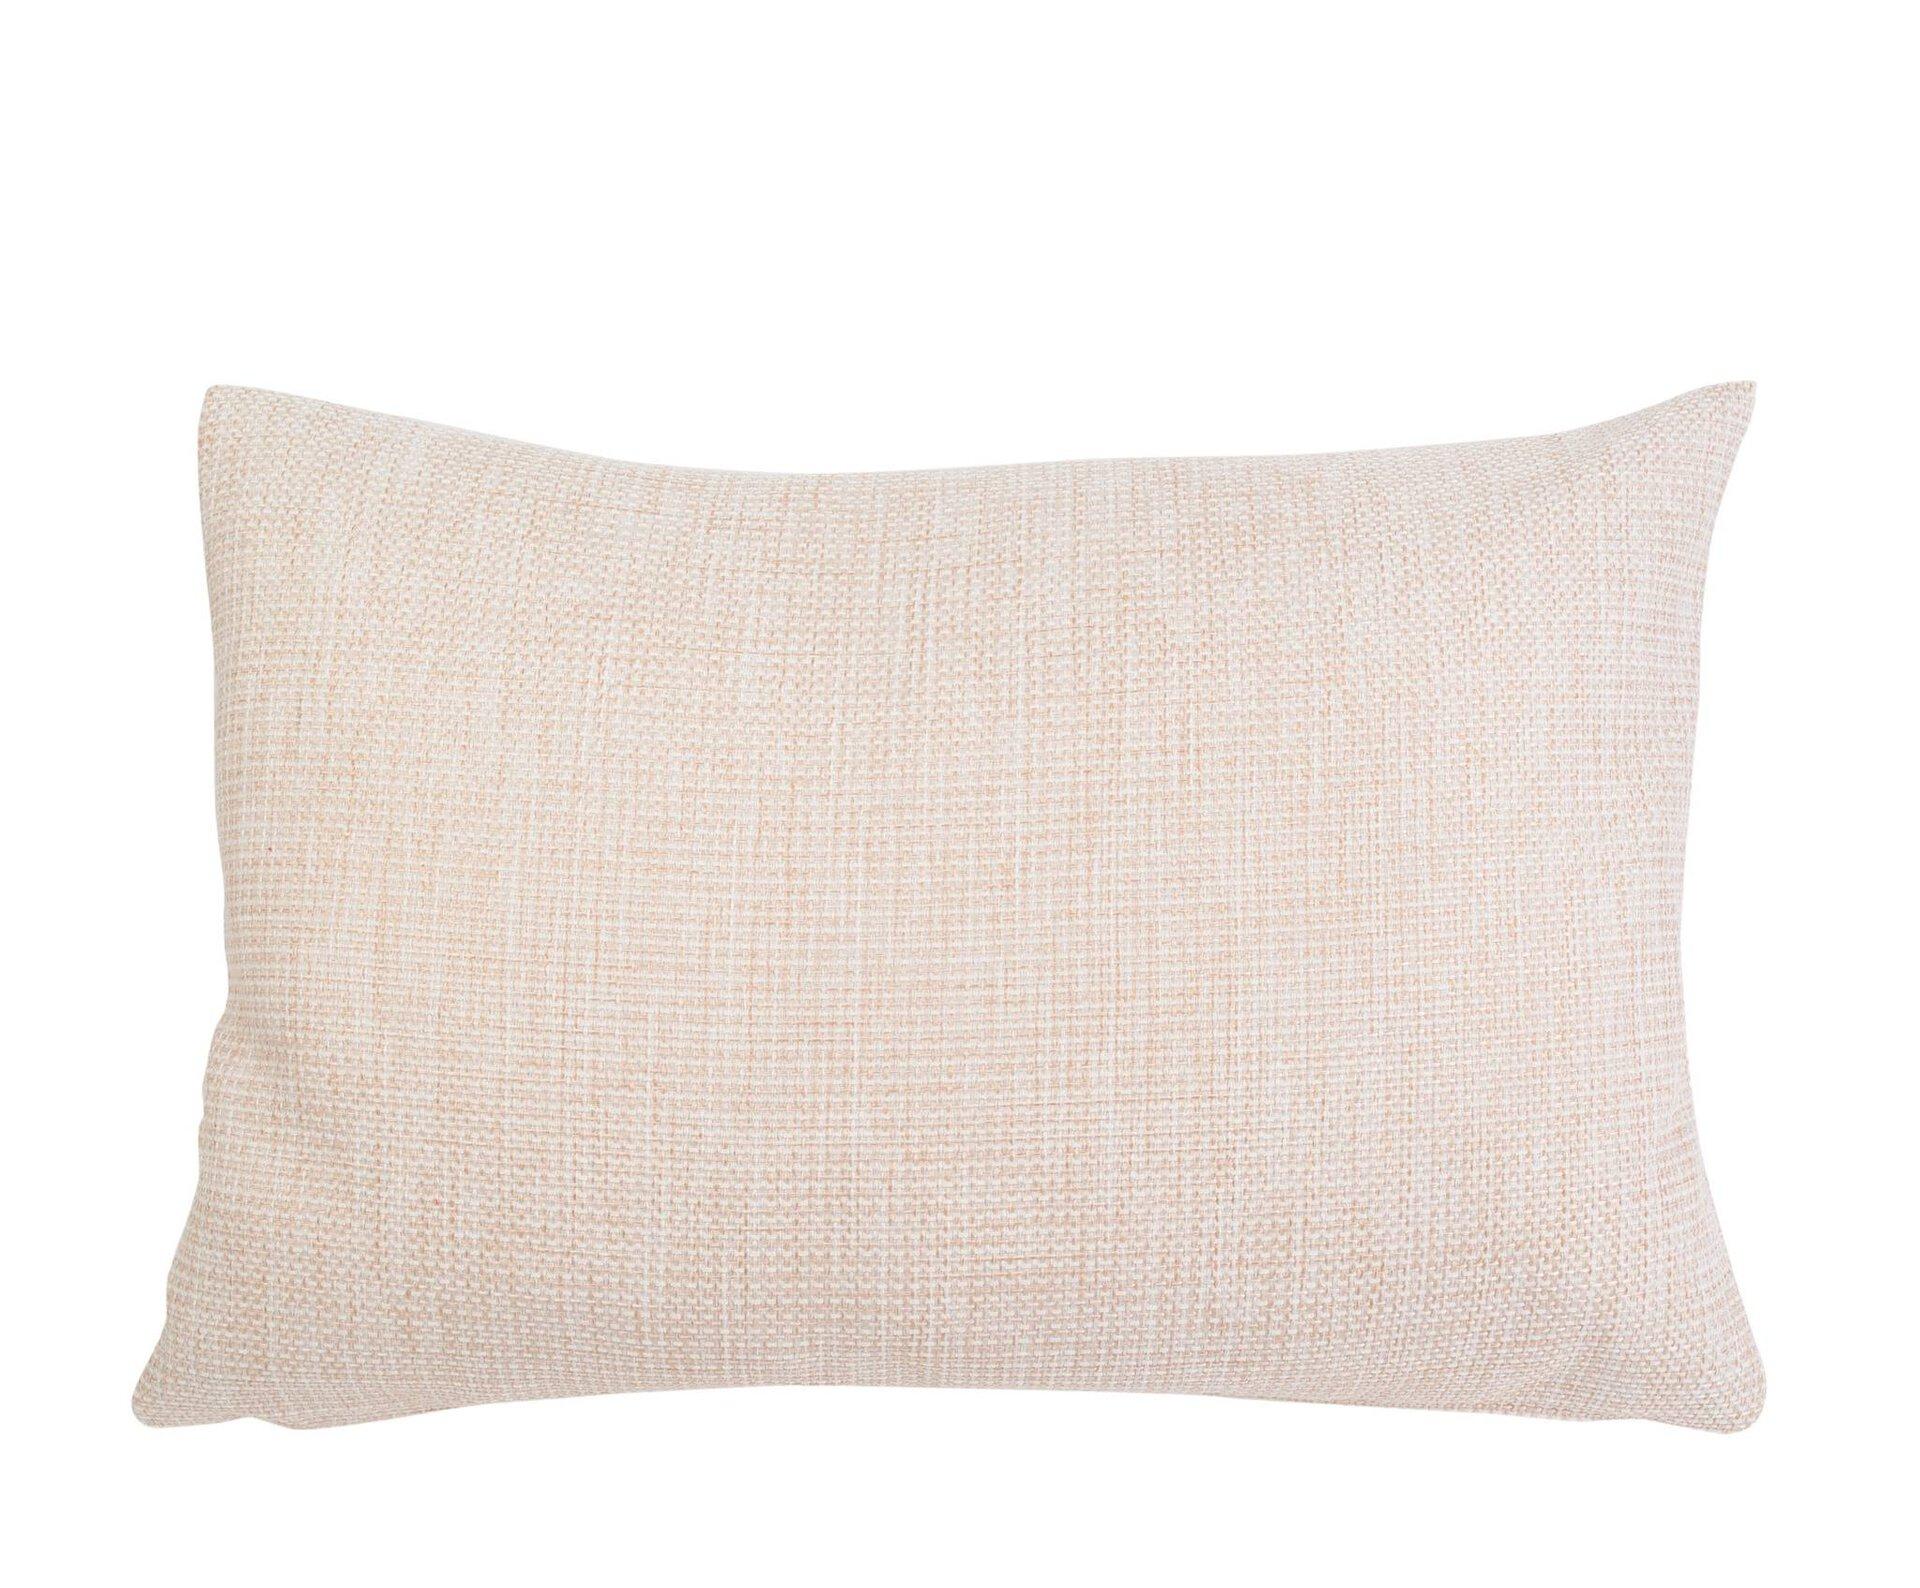 Kissenhülle Dallas Ambiente Trendlife Textil weiß 40 x 40 cm